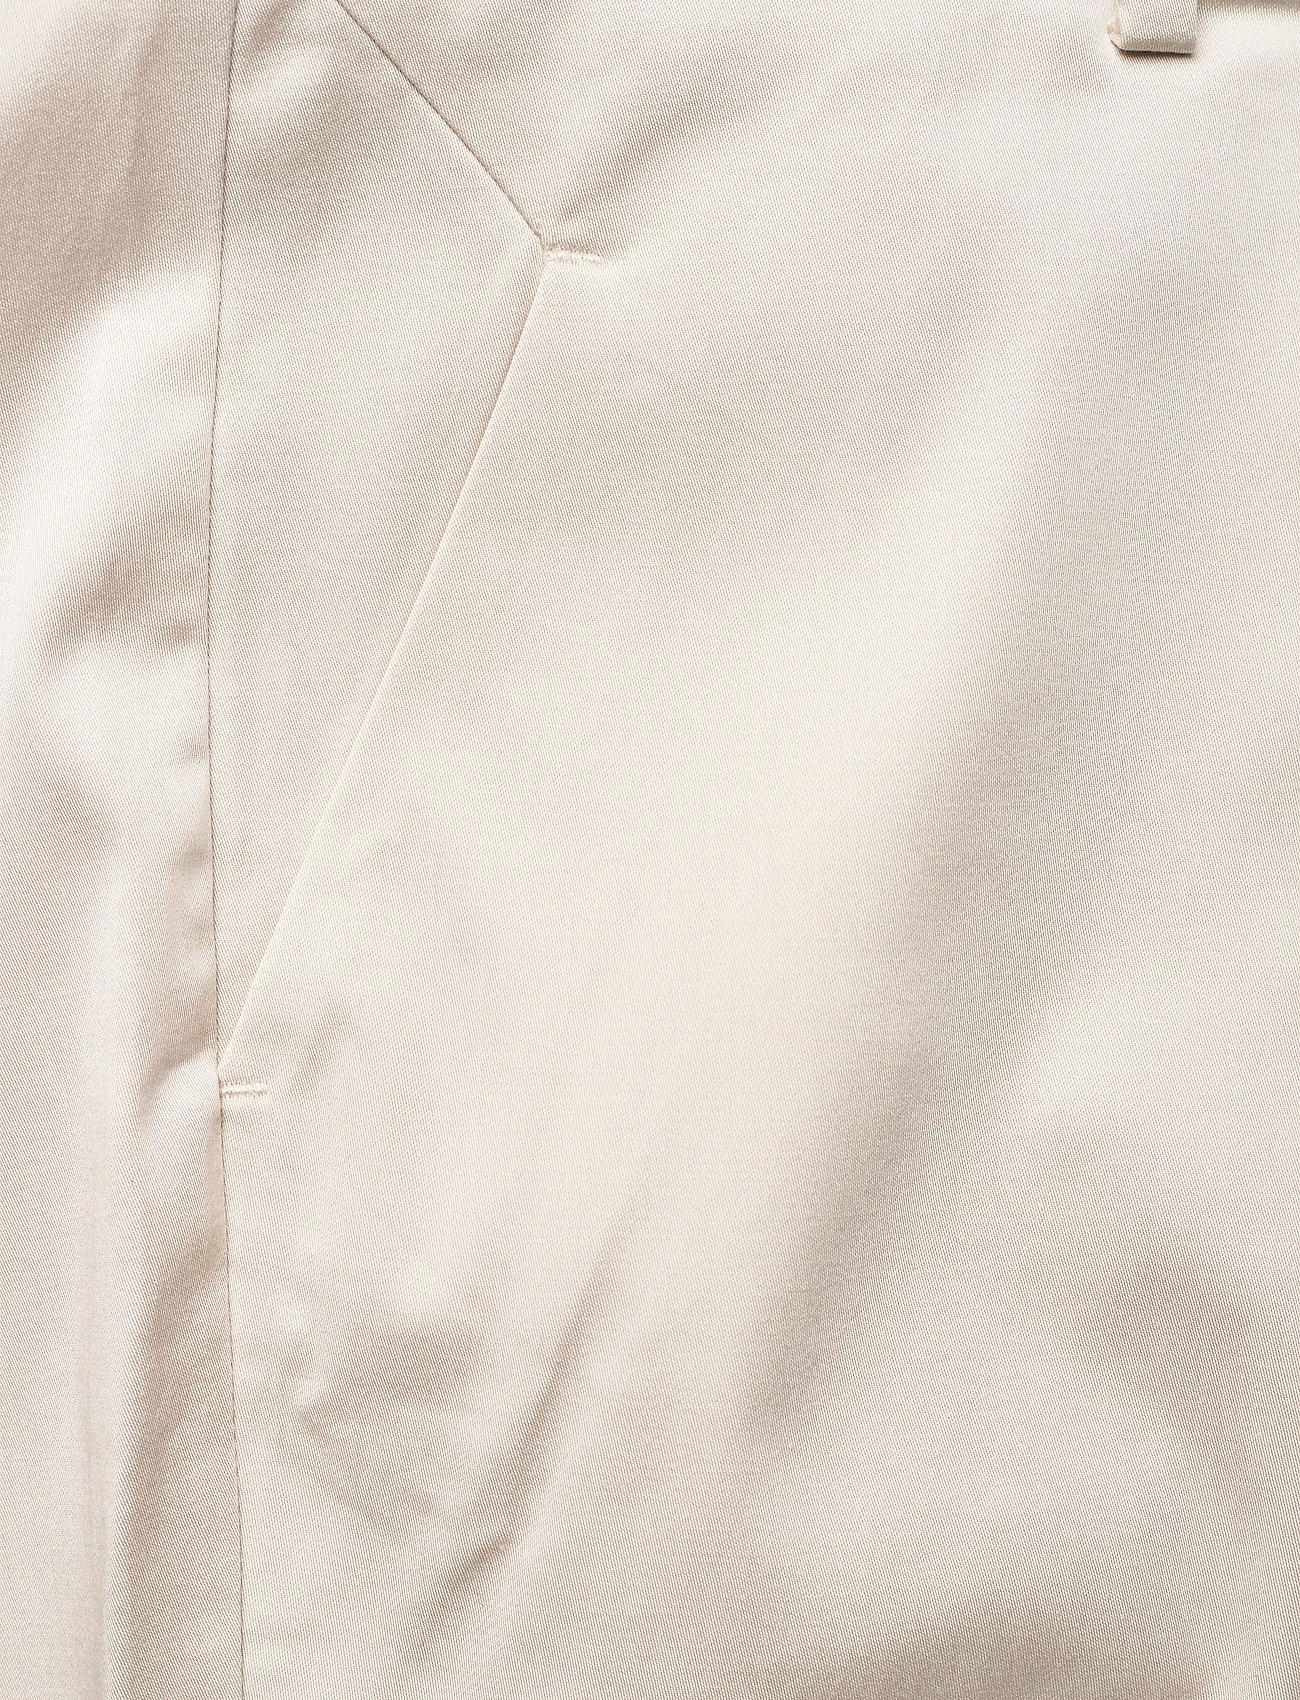 FIVEUNITS - Kylie Crop 531 - bukser med lige ben - moonbeam - 4